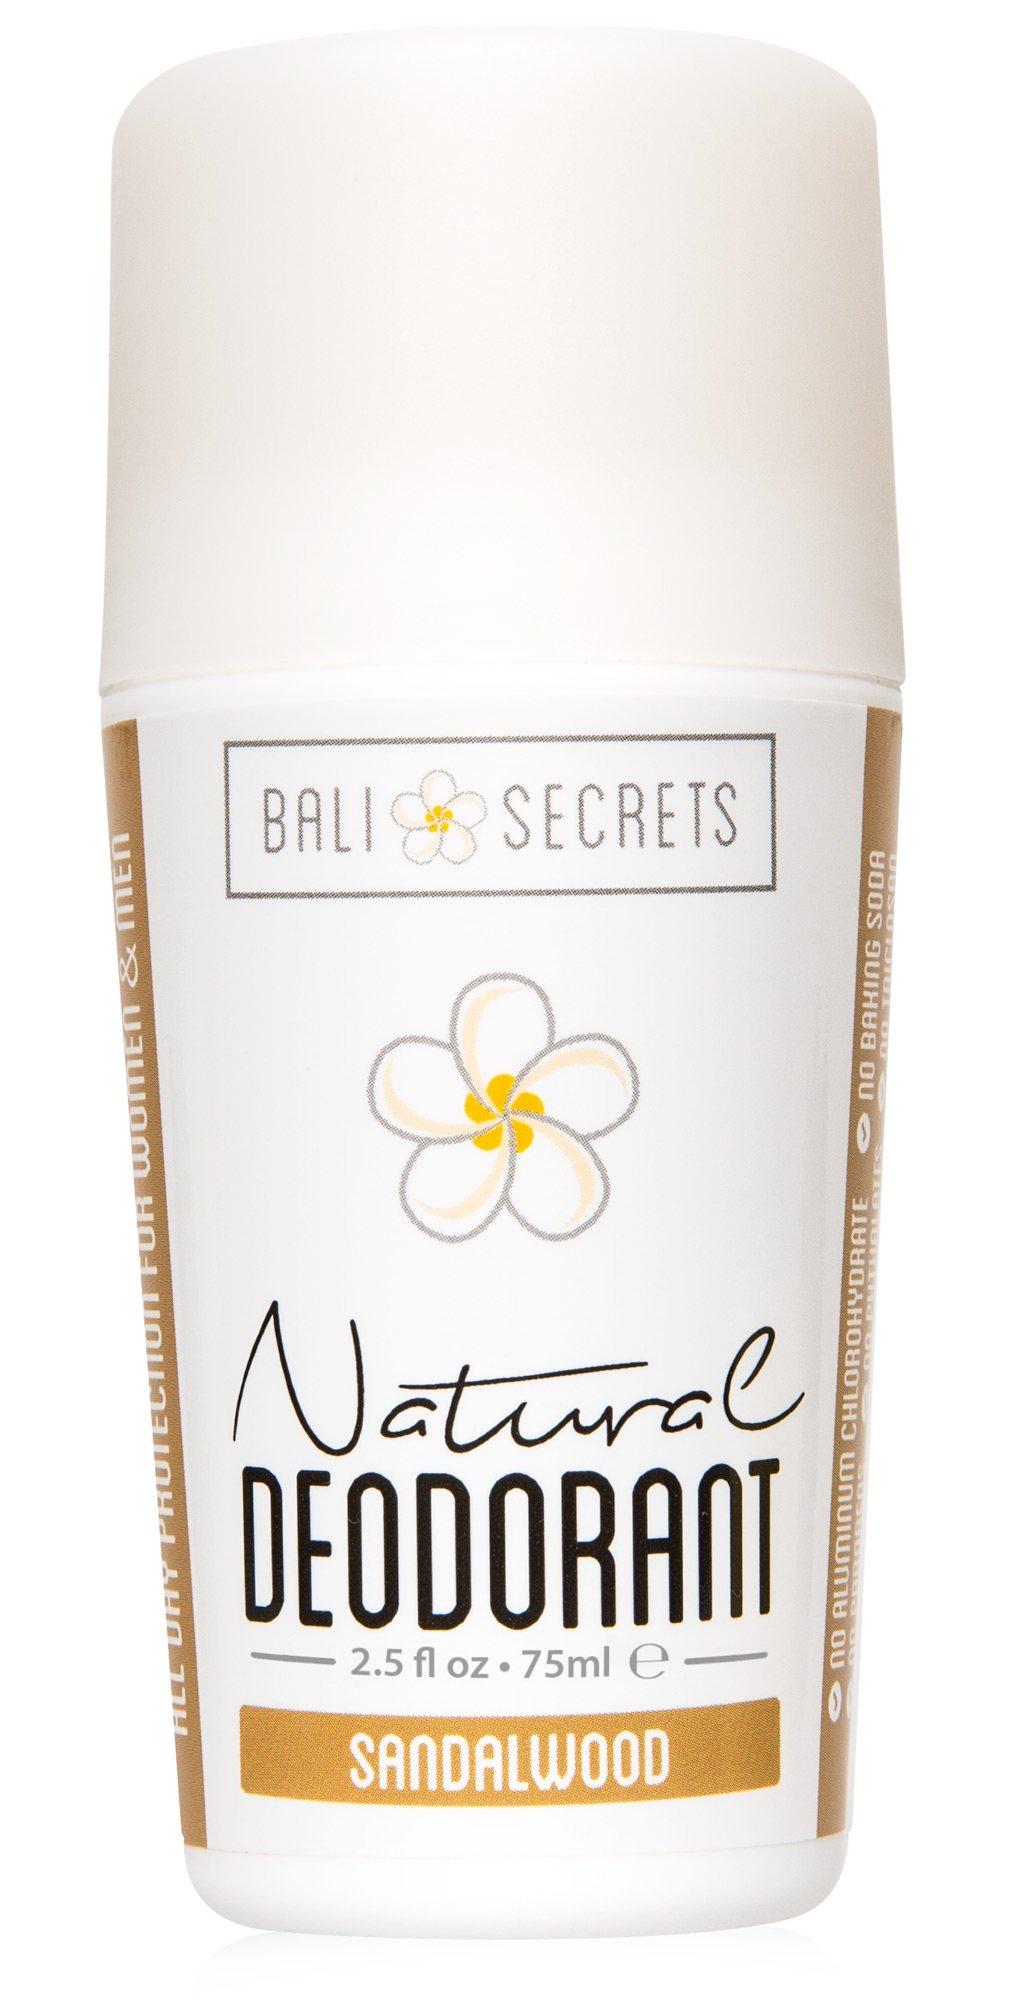 Bali Secrets Natural Deodorant - Organic & Vegan - For Women & Men - All Day Fresh - Strong & Reliable Protection - 2.5 fl.oz/75ml [Scent: Sandalwood]